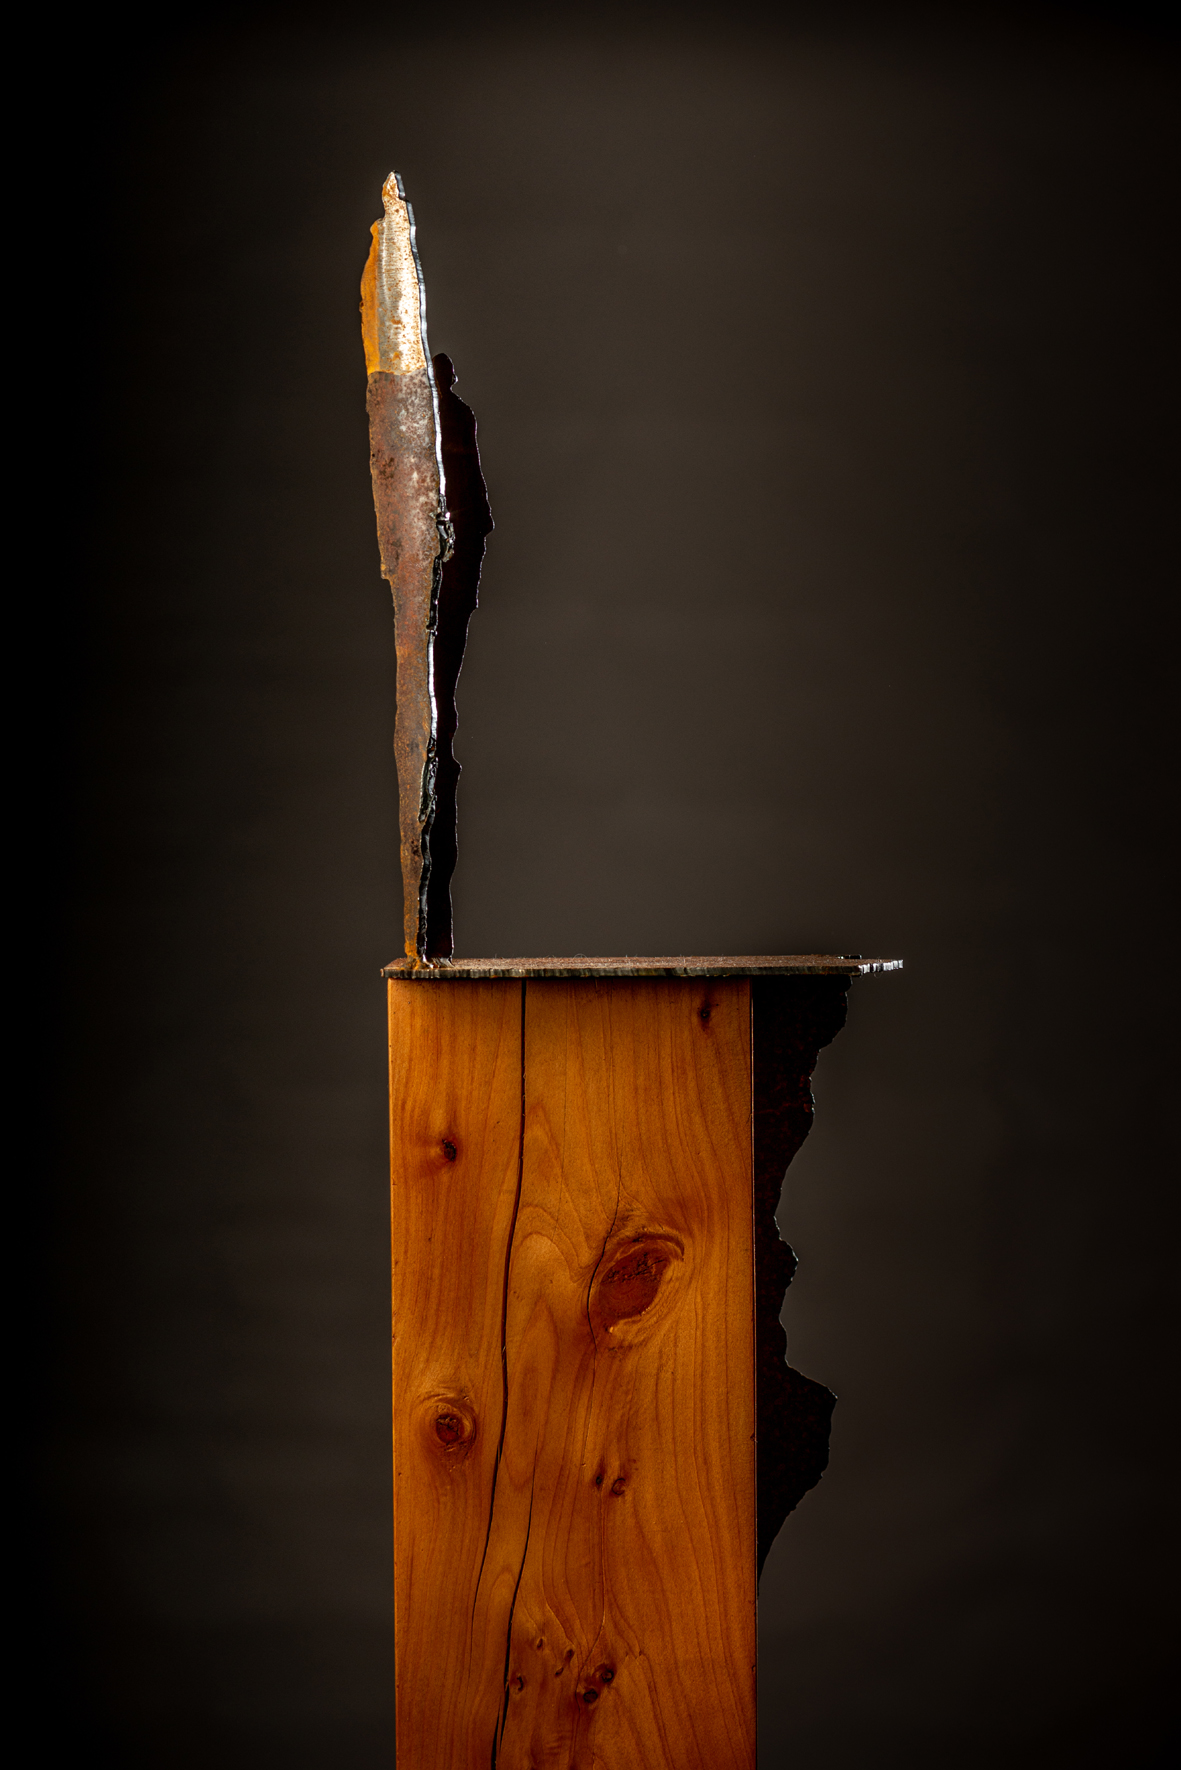 The sharp edge, sold